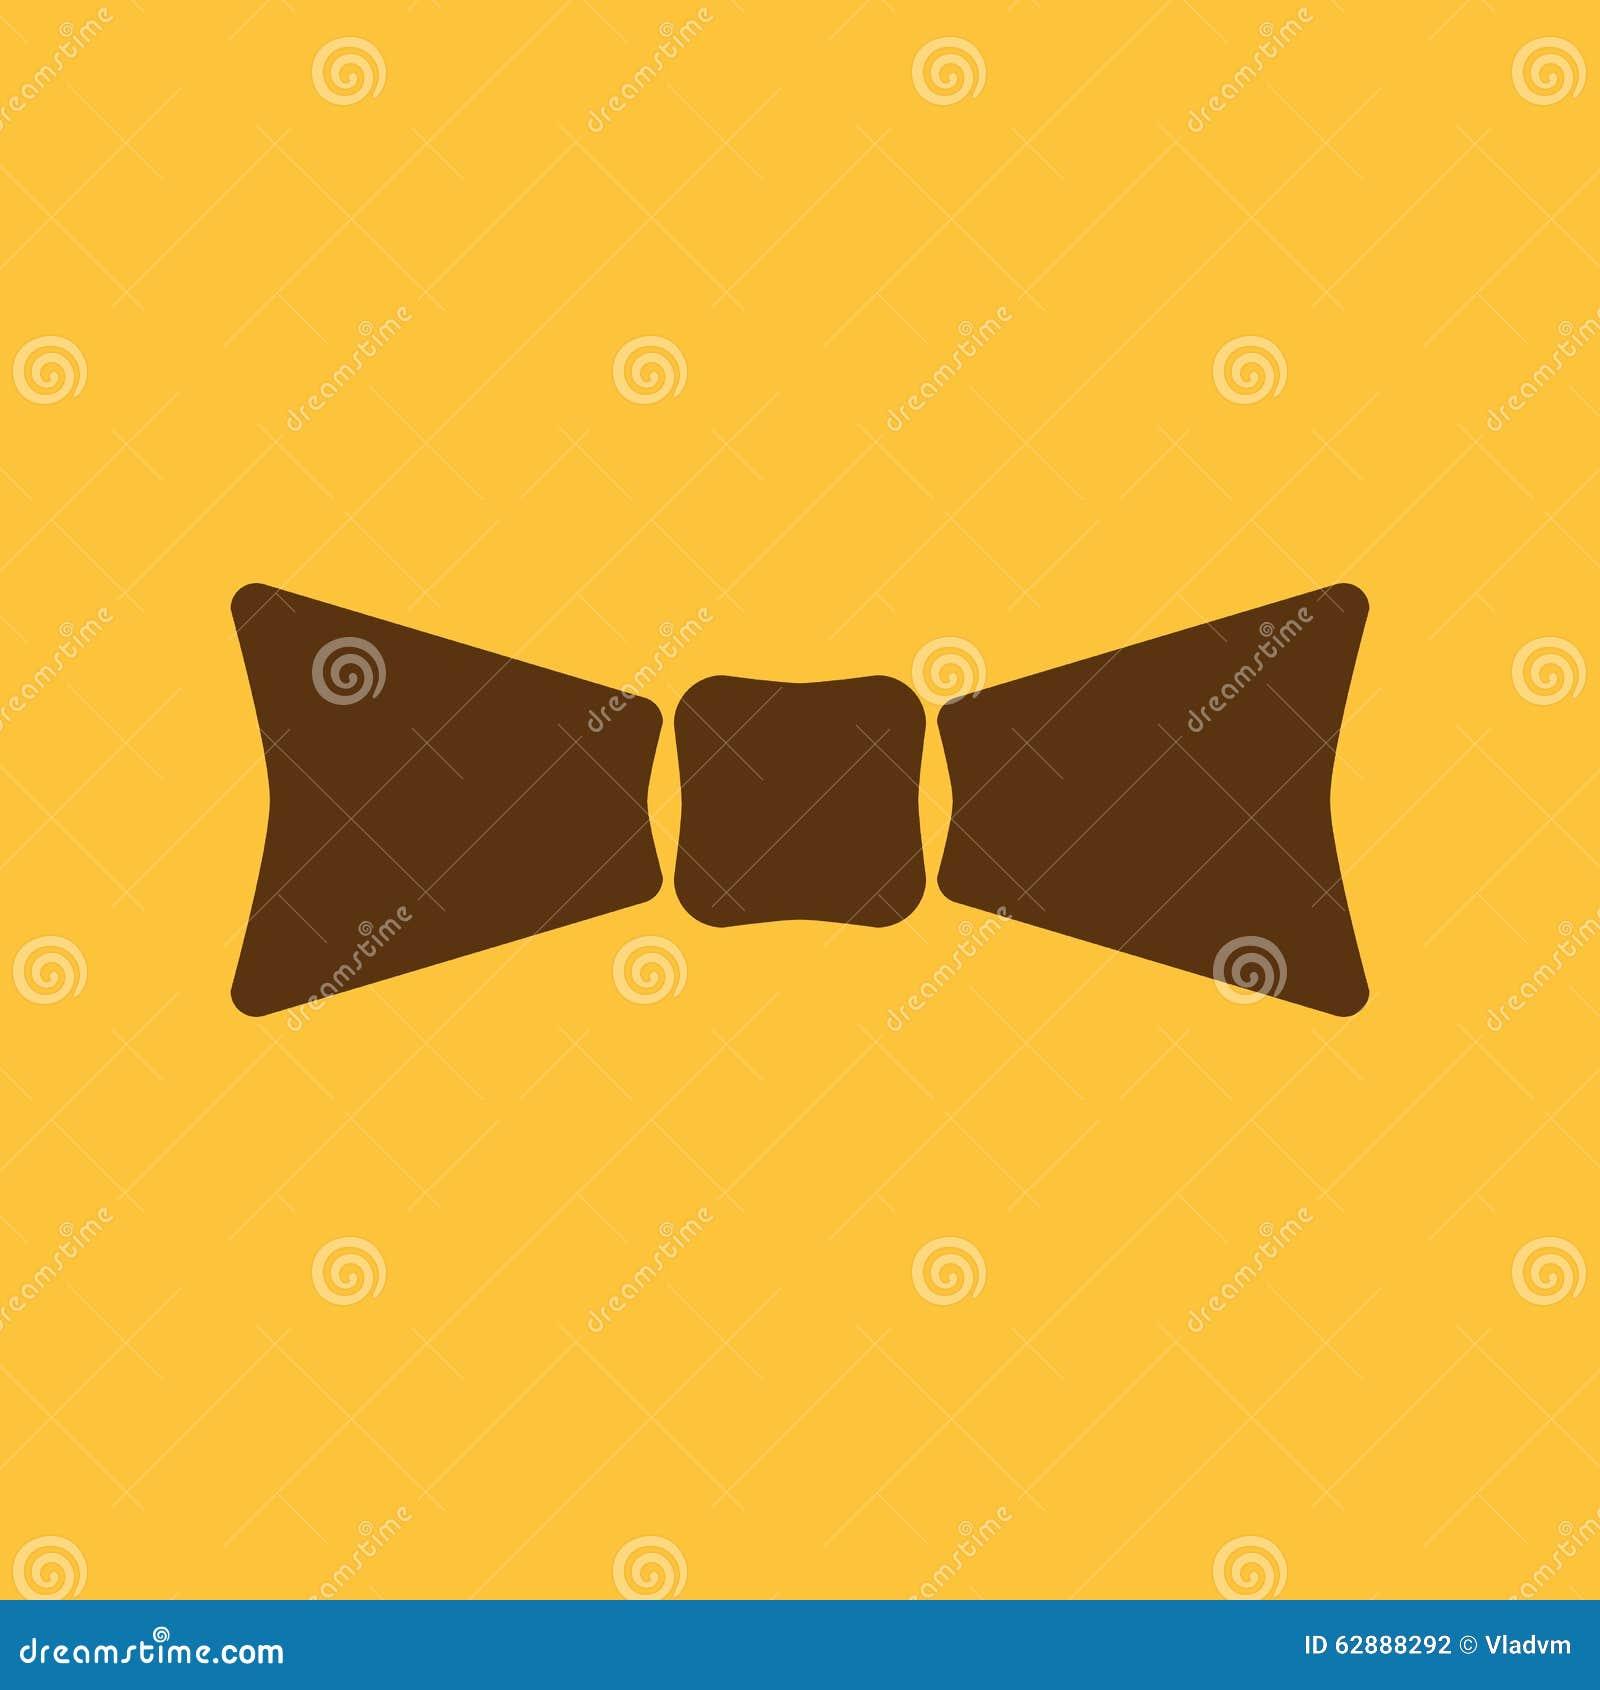 The Bow Tie Icon Bow Tie Symbol Flat Stock Illustration